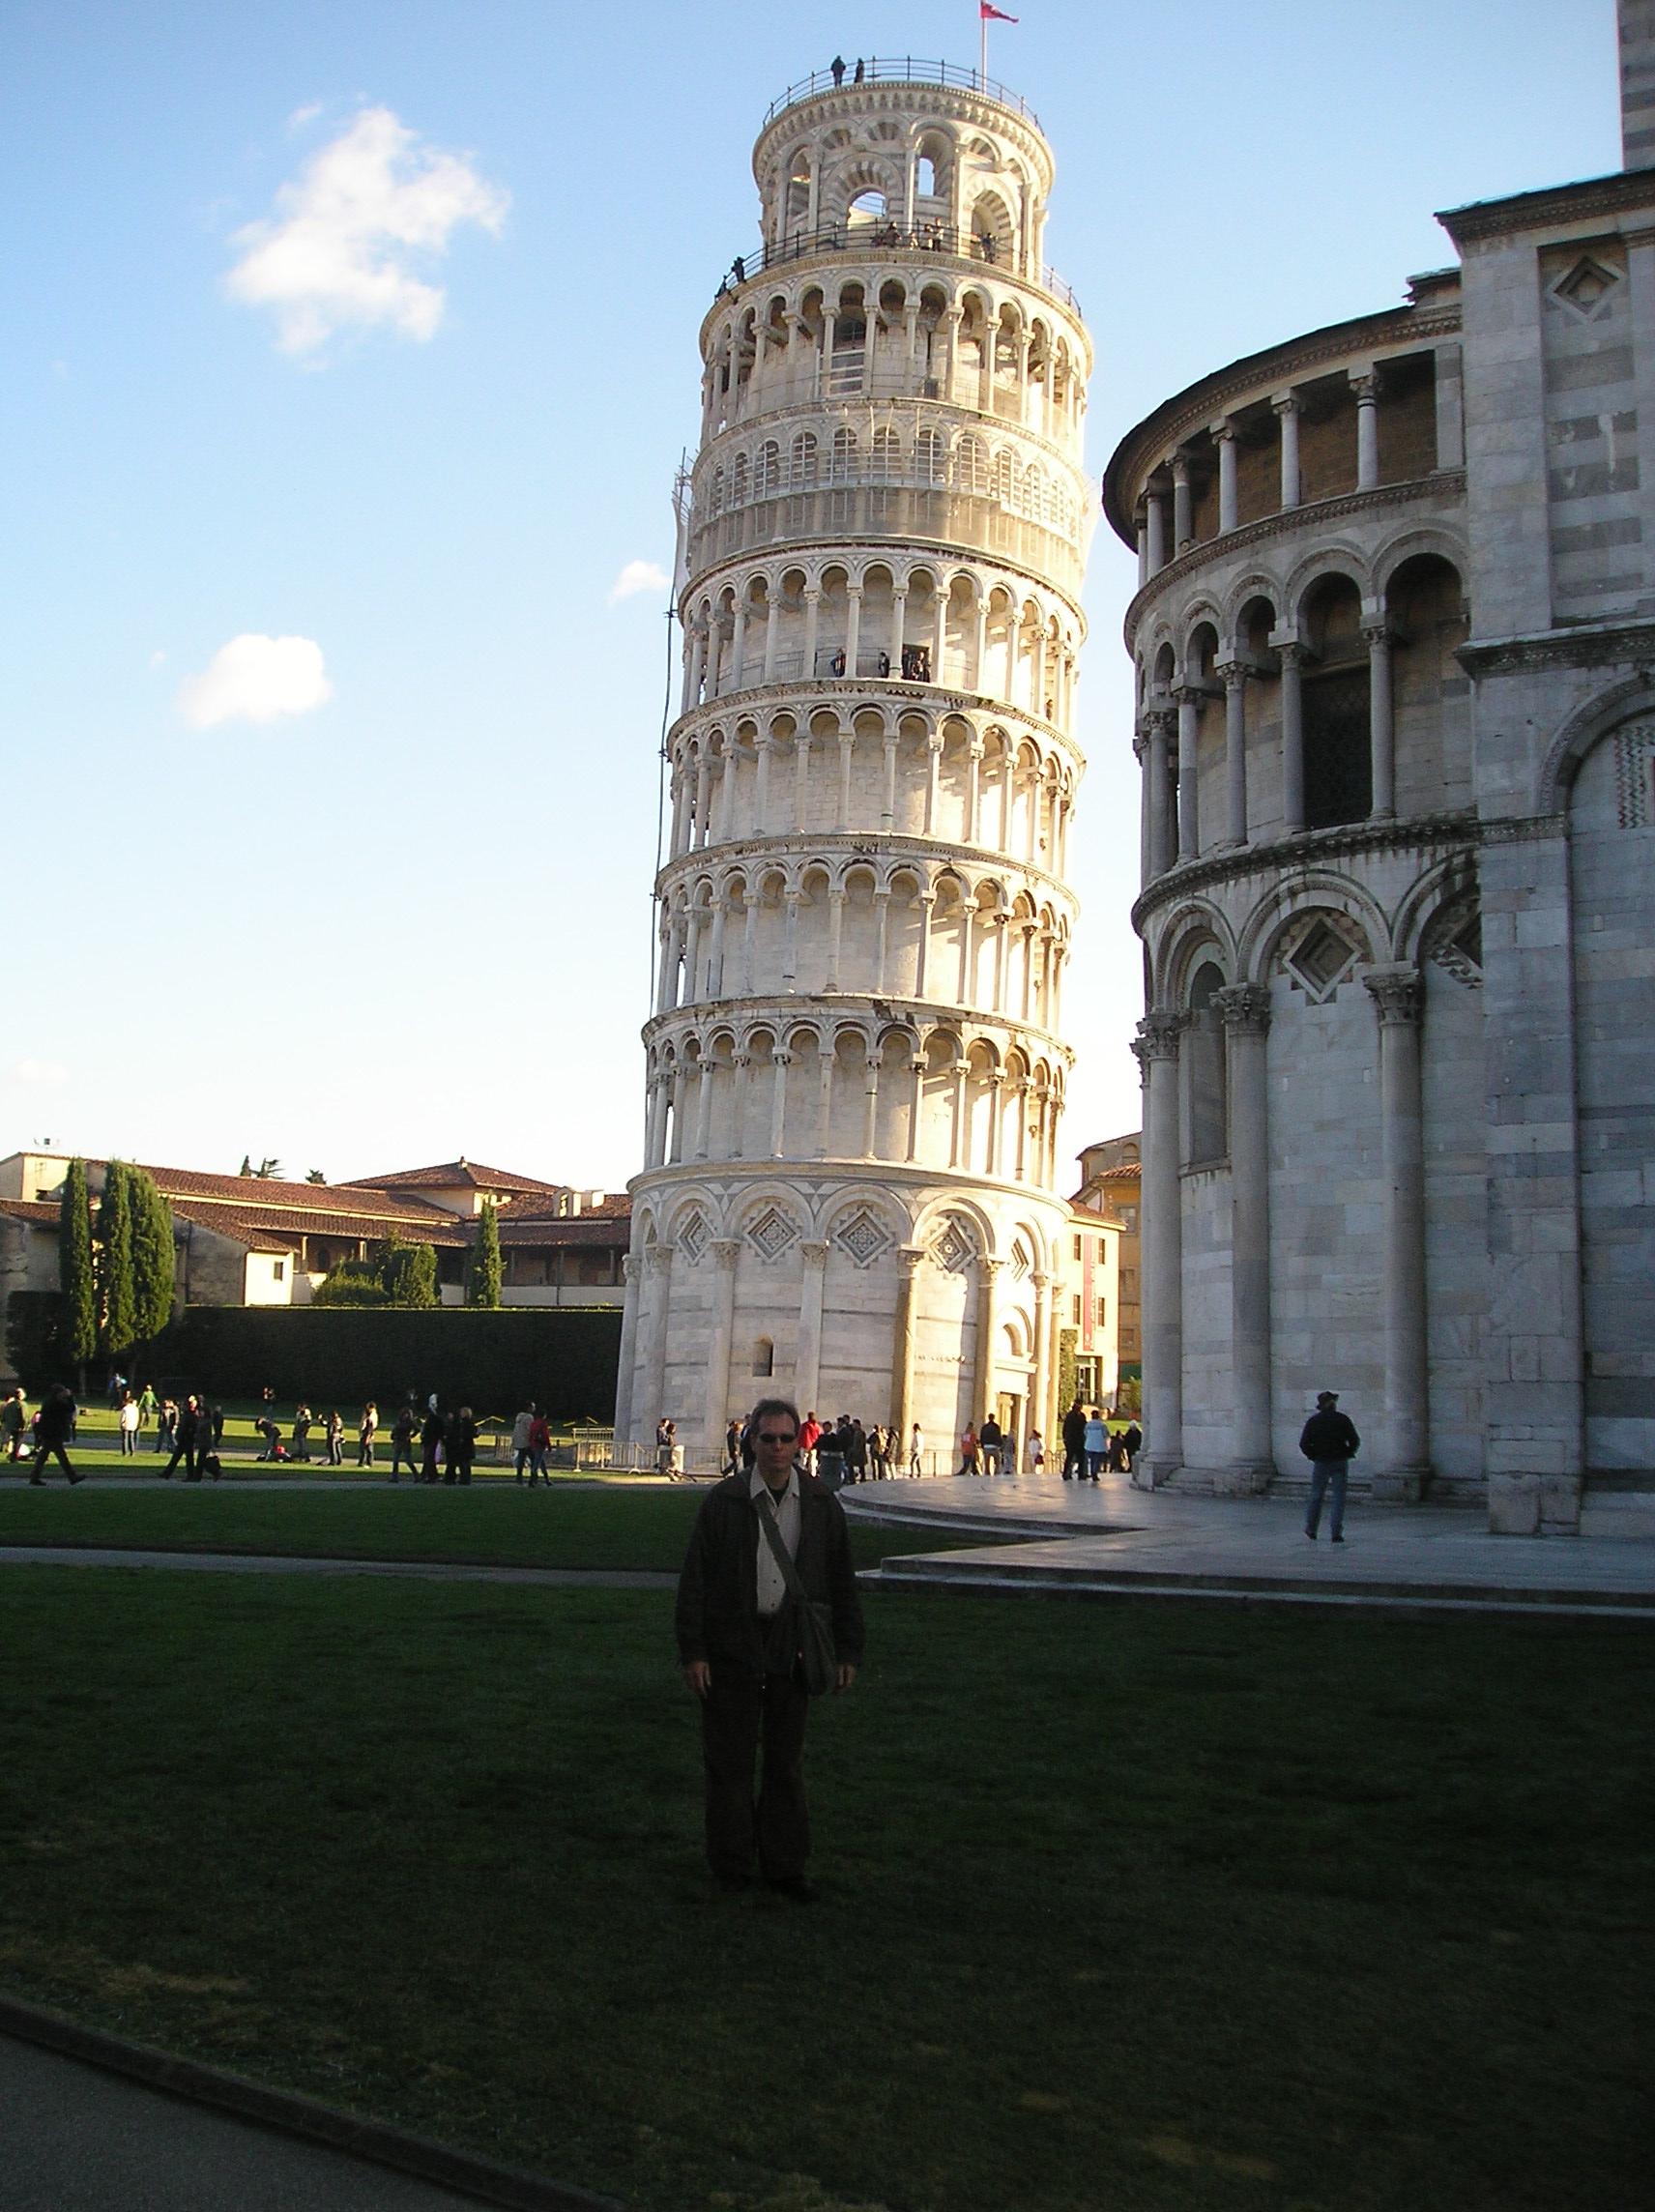 CRO Italy web 2007 - 41.jpg